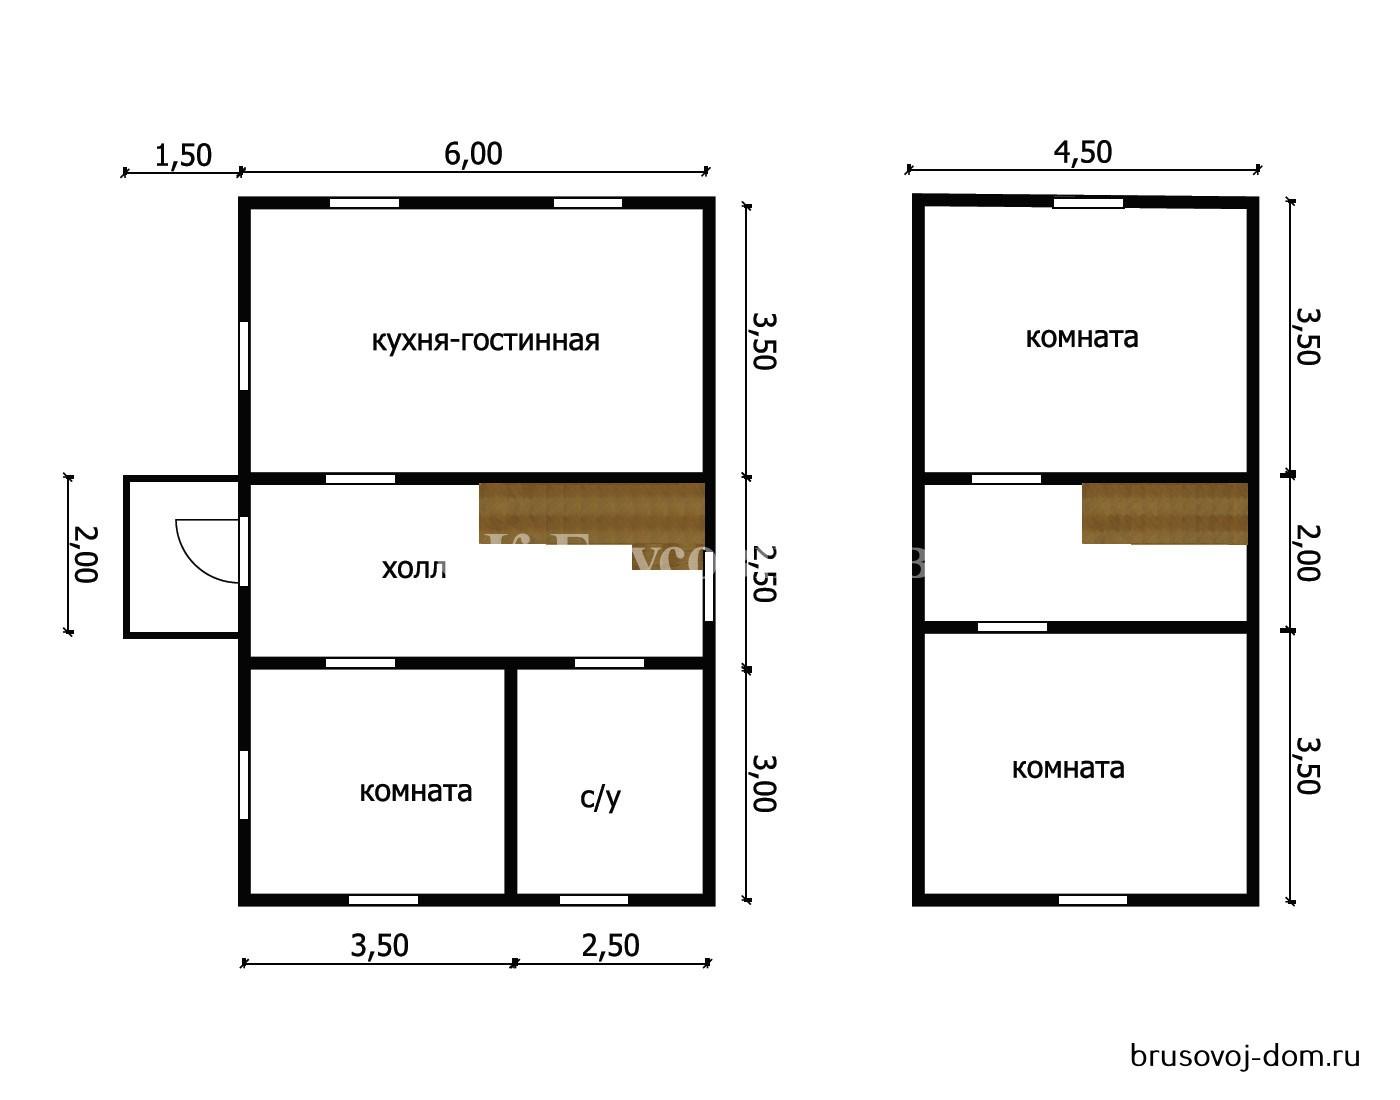 Дом под усадку 6х9 м Подпорожье